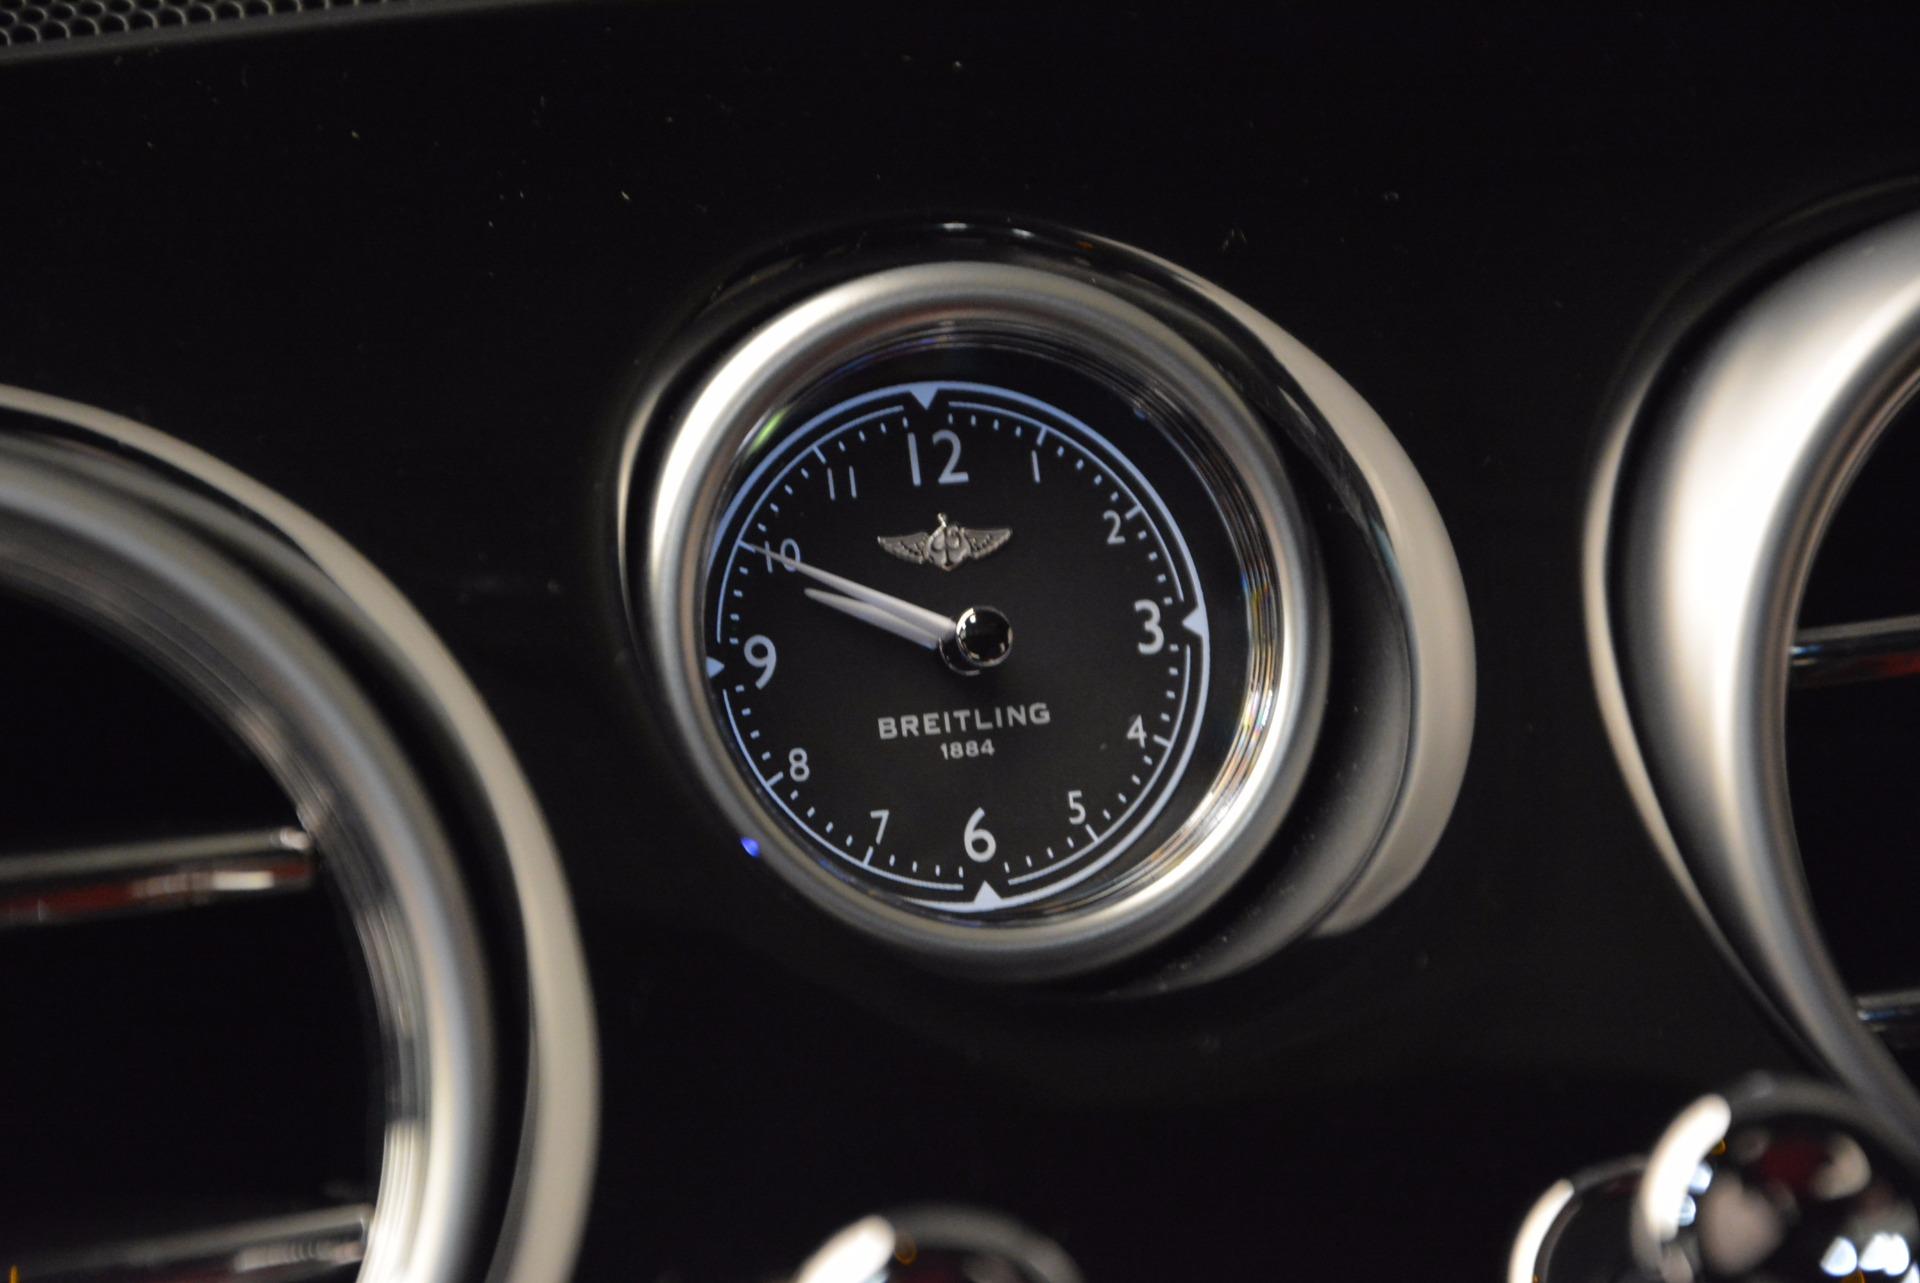 Used 2017 Bentley Flying Spur V8 S For Sale In Westport, CT 875_p30